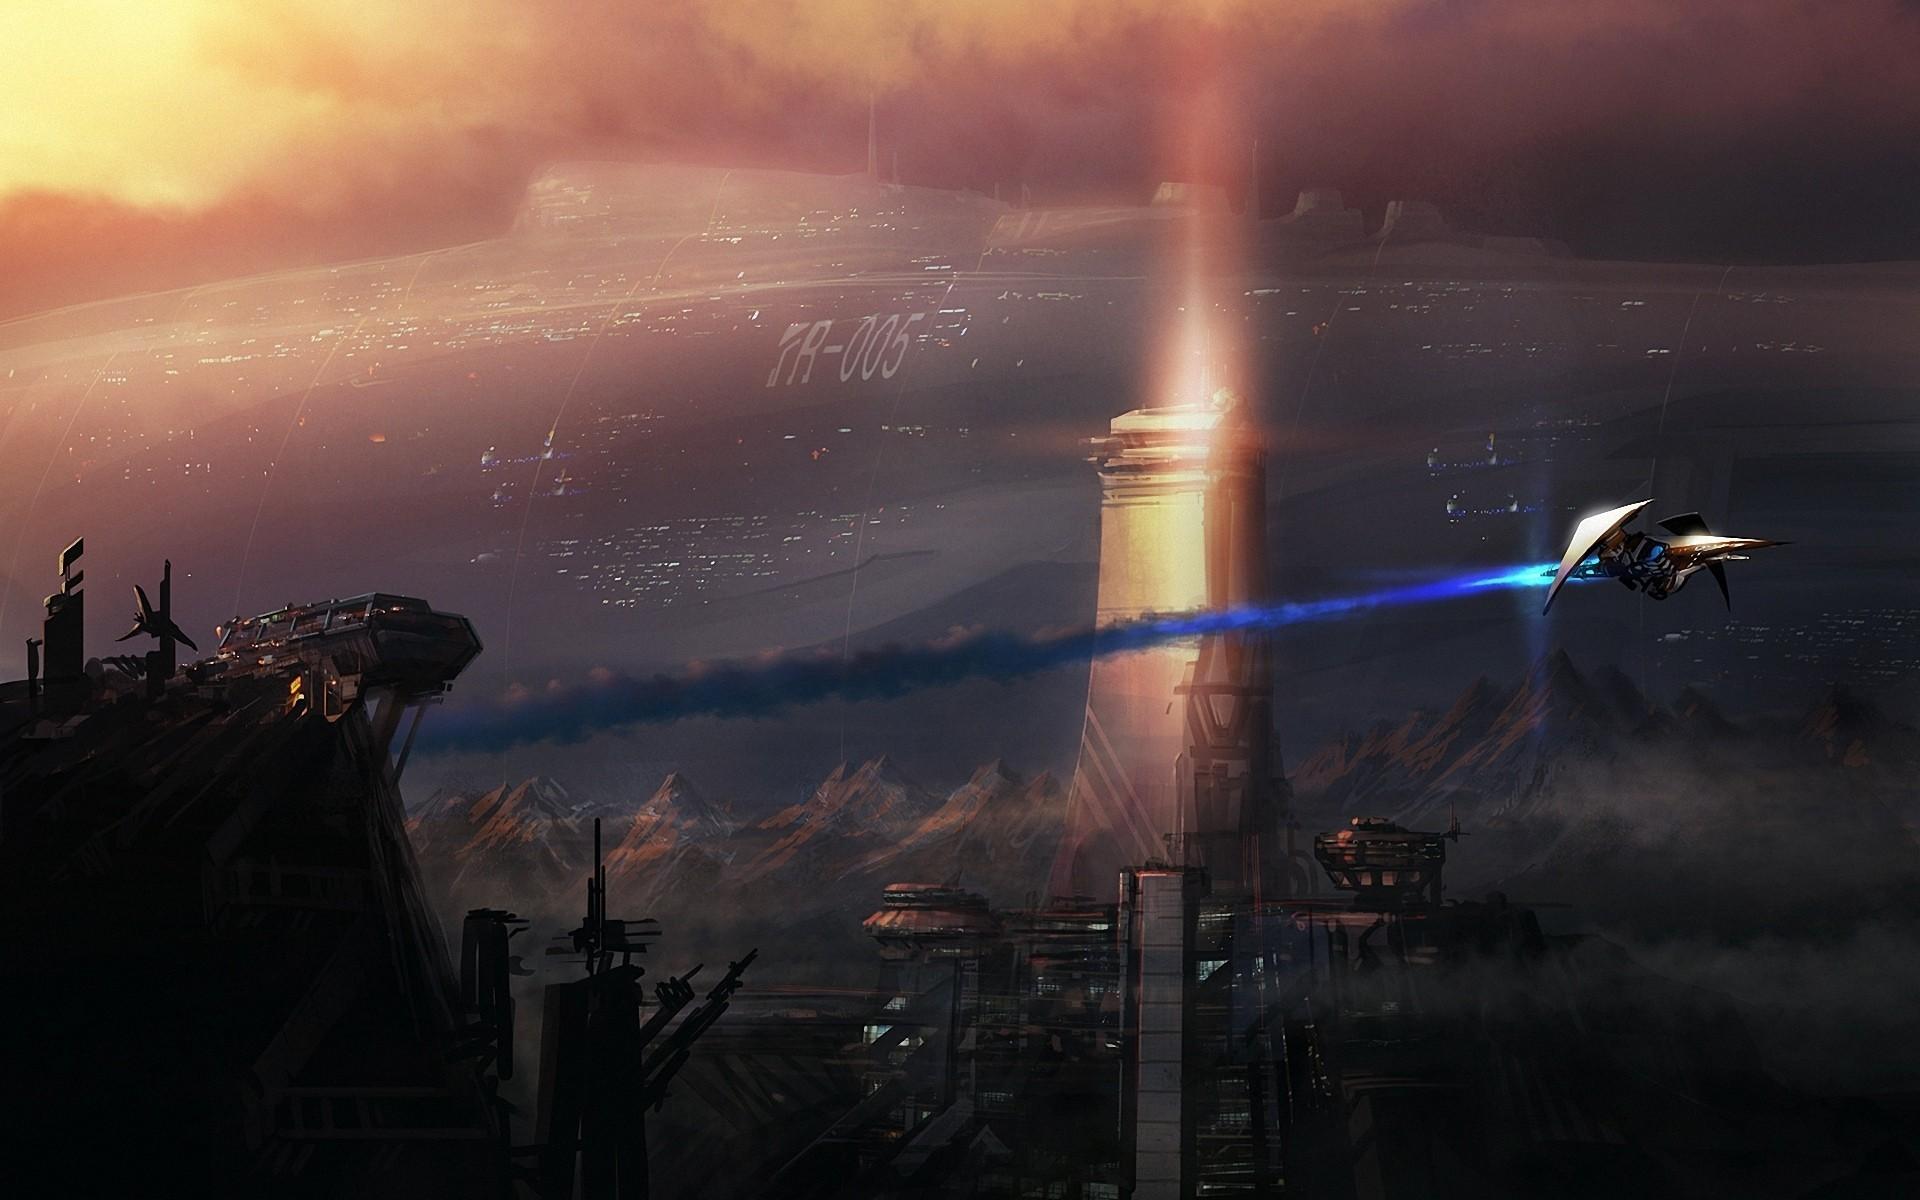 General 1920x1200 space spaceship science fiction digital art concept art fantasy art artwork city